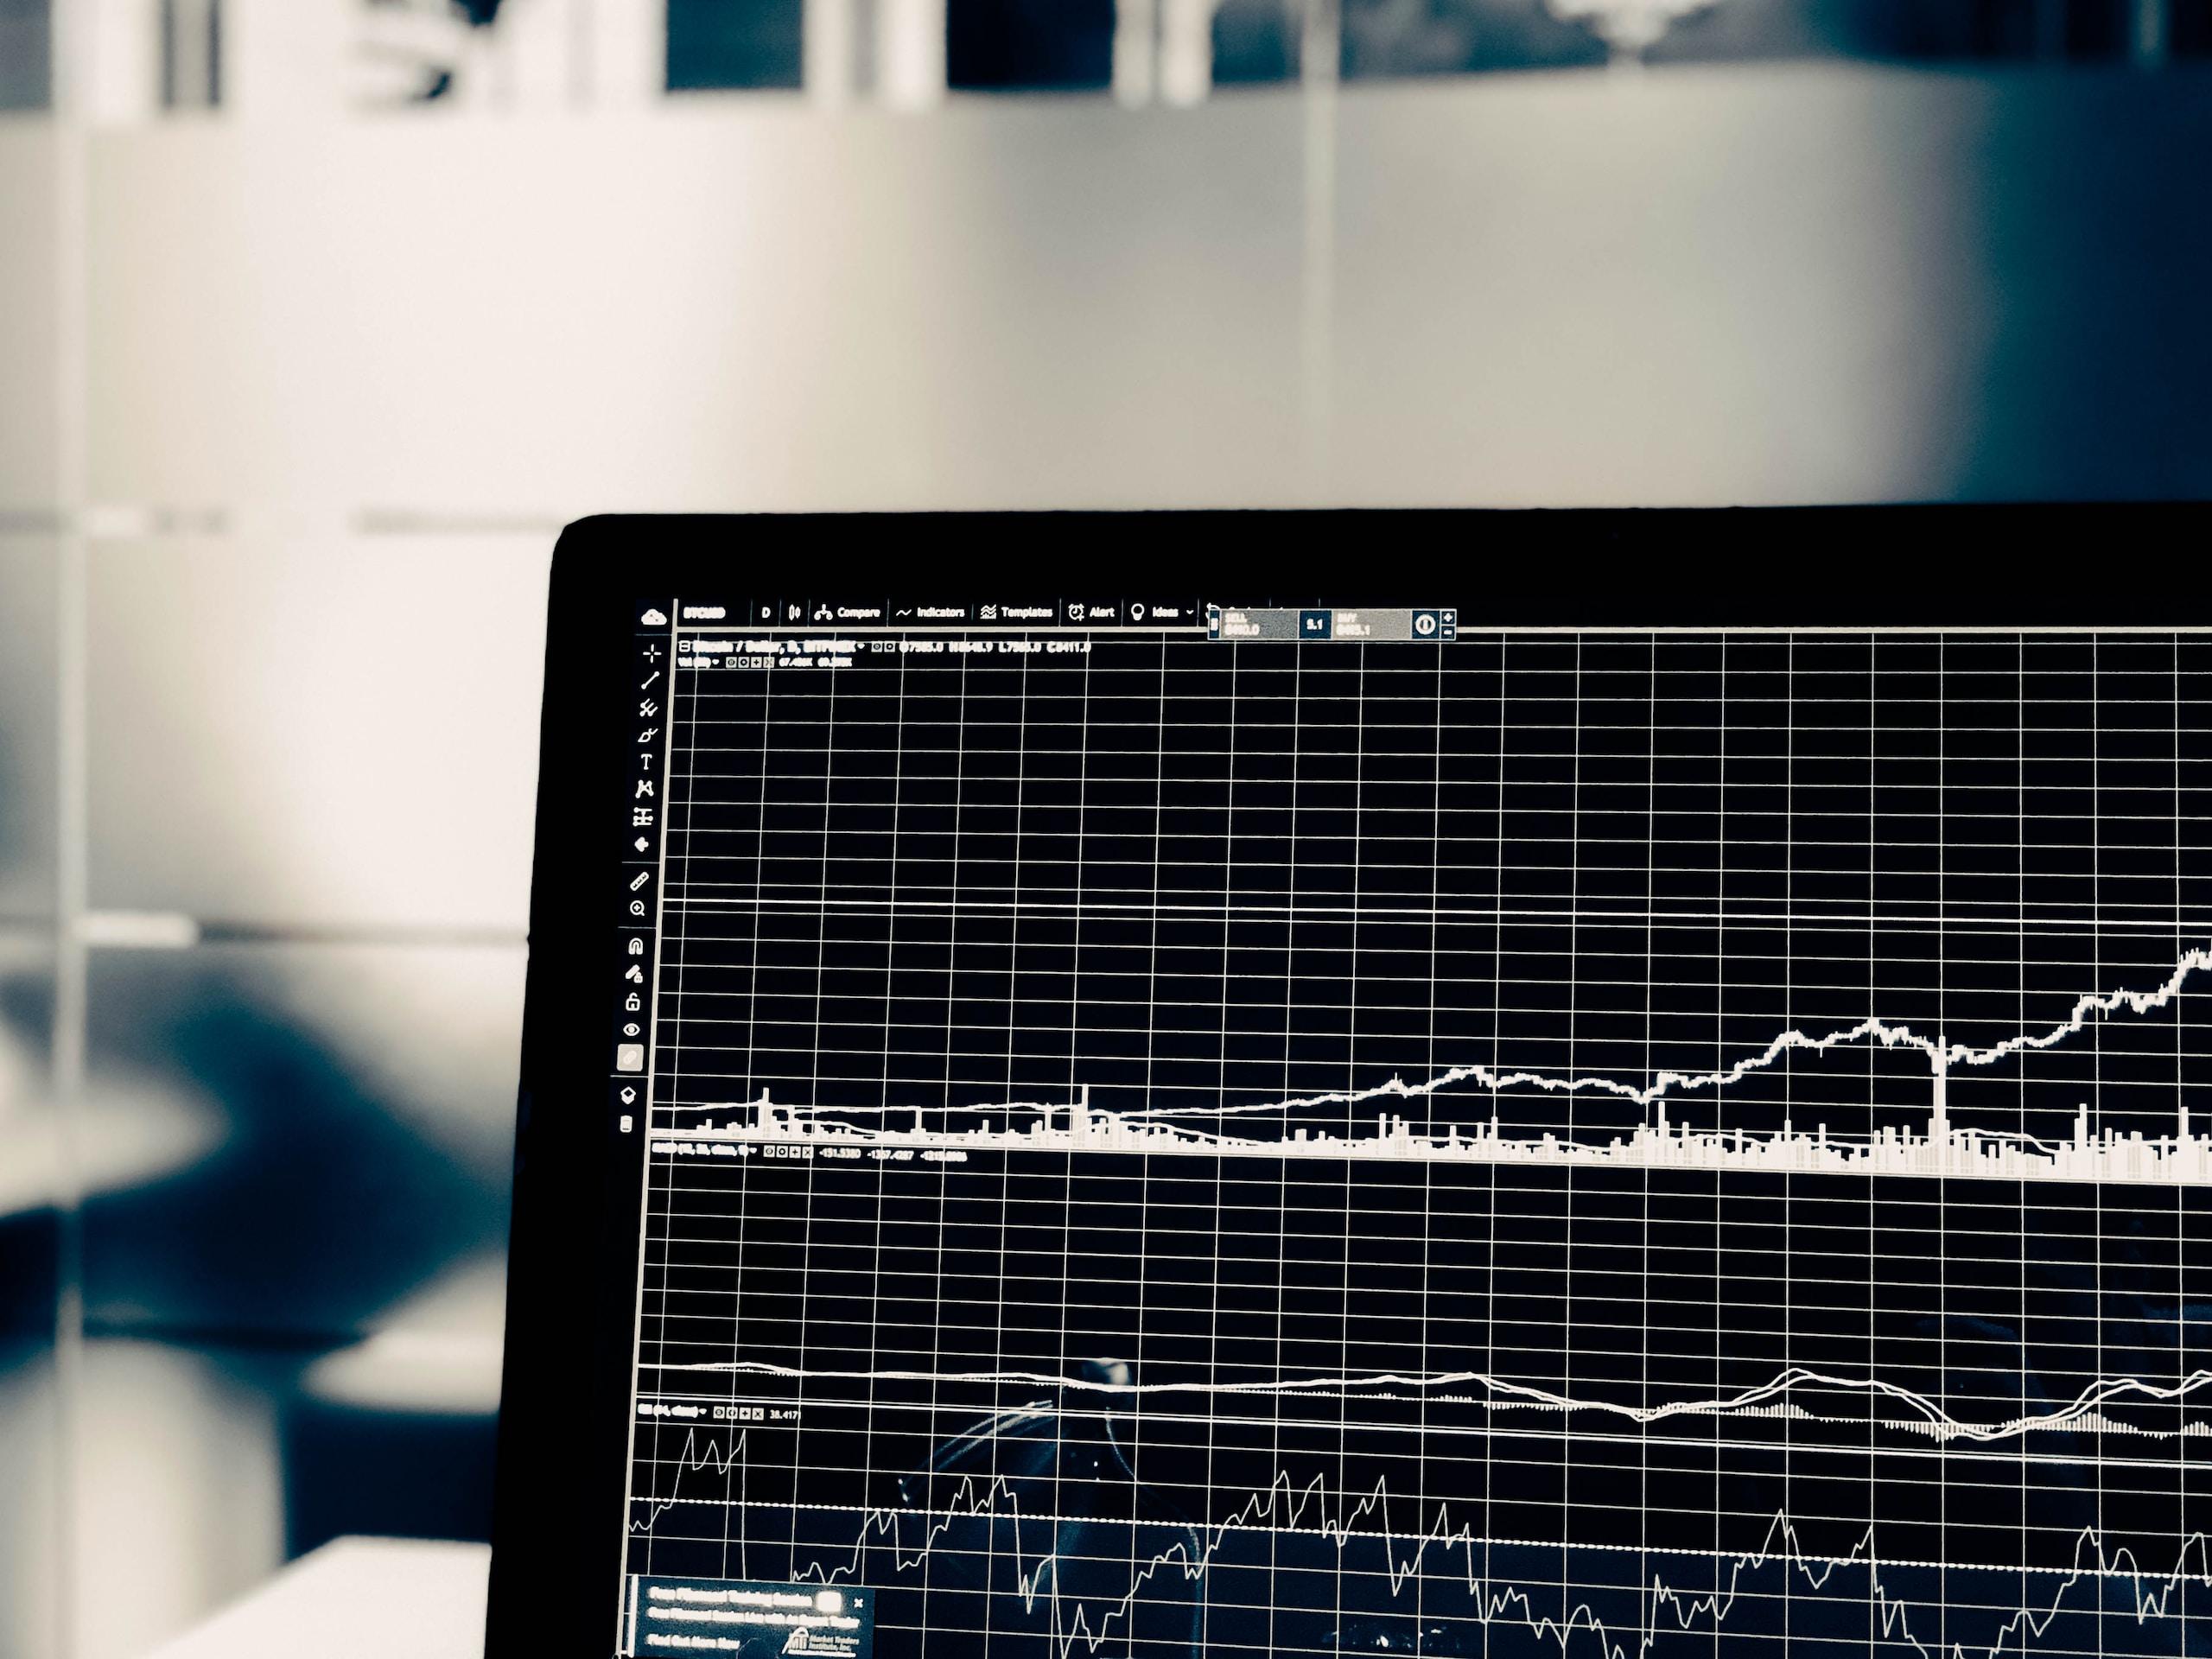 Mesure de performance statistique